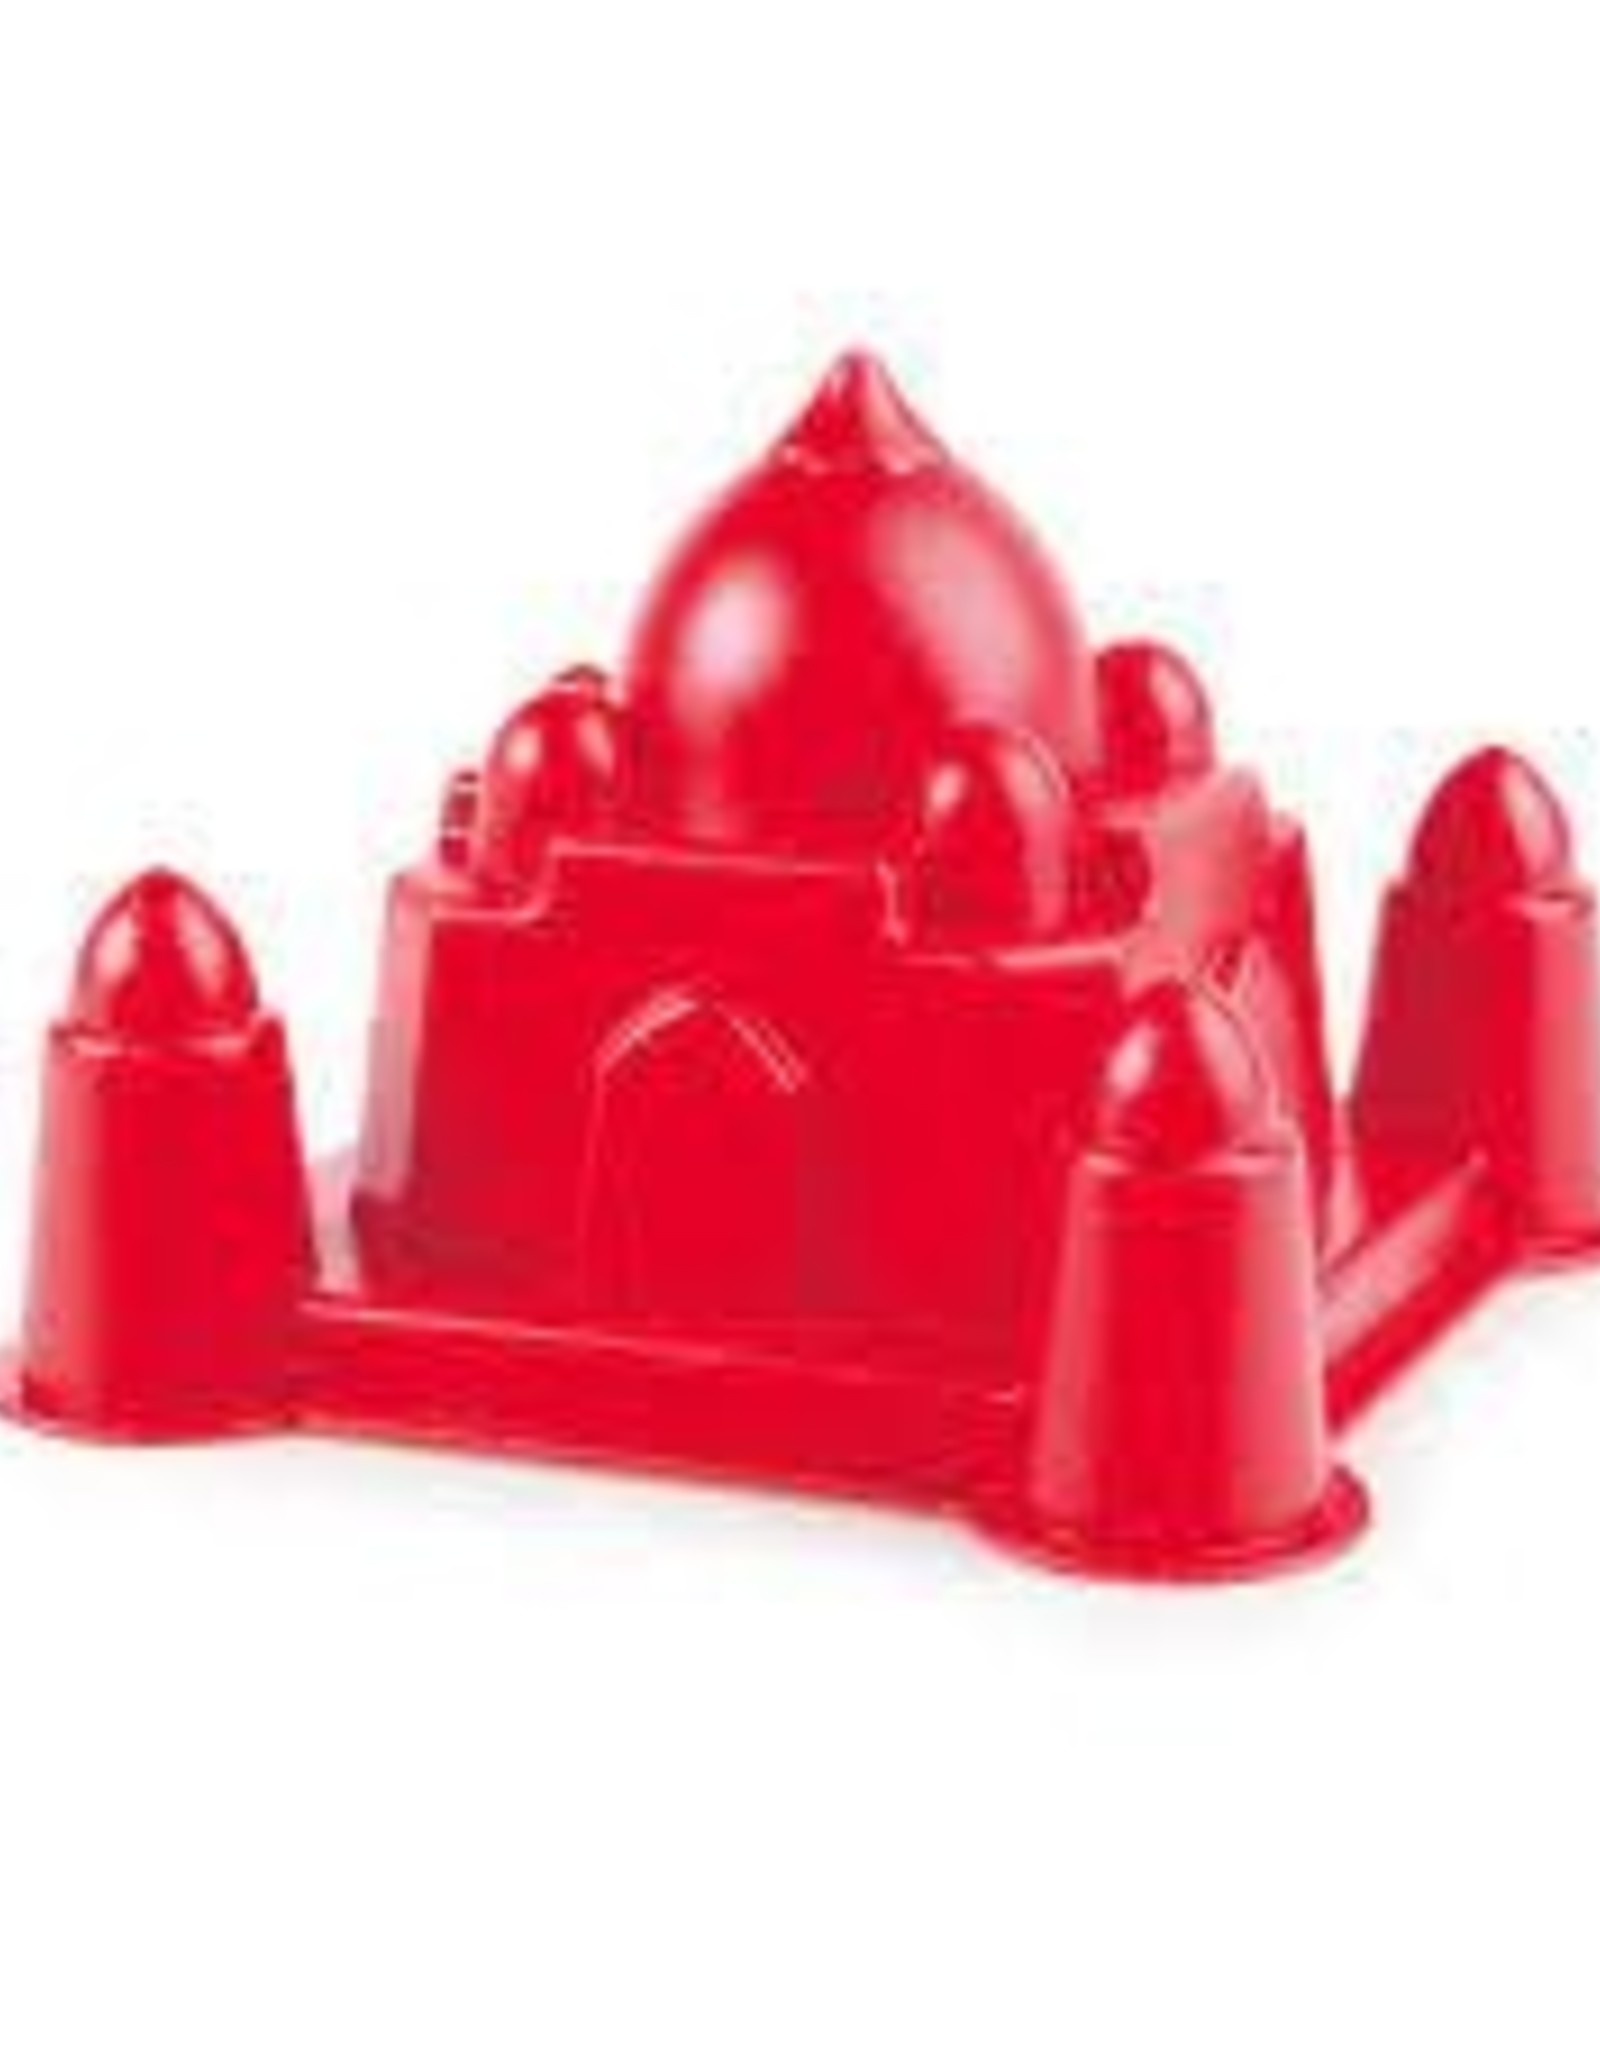 Hape Toys Taj Mahal Sand Toy